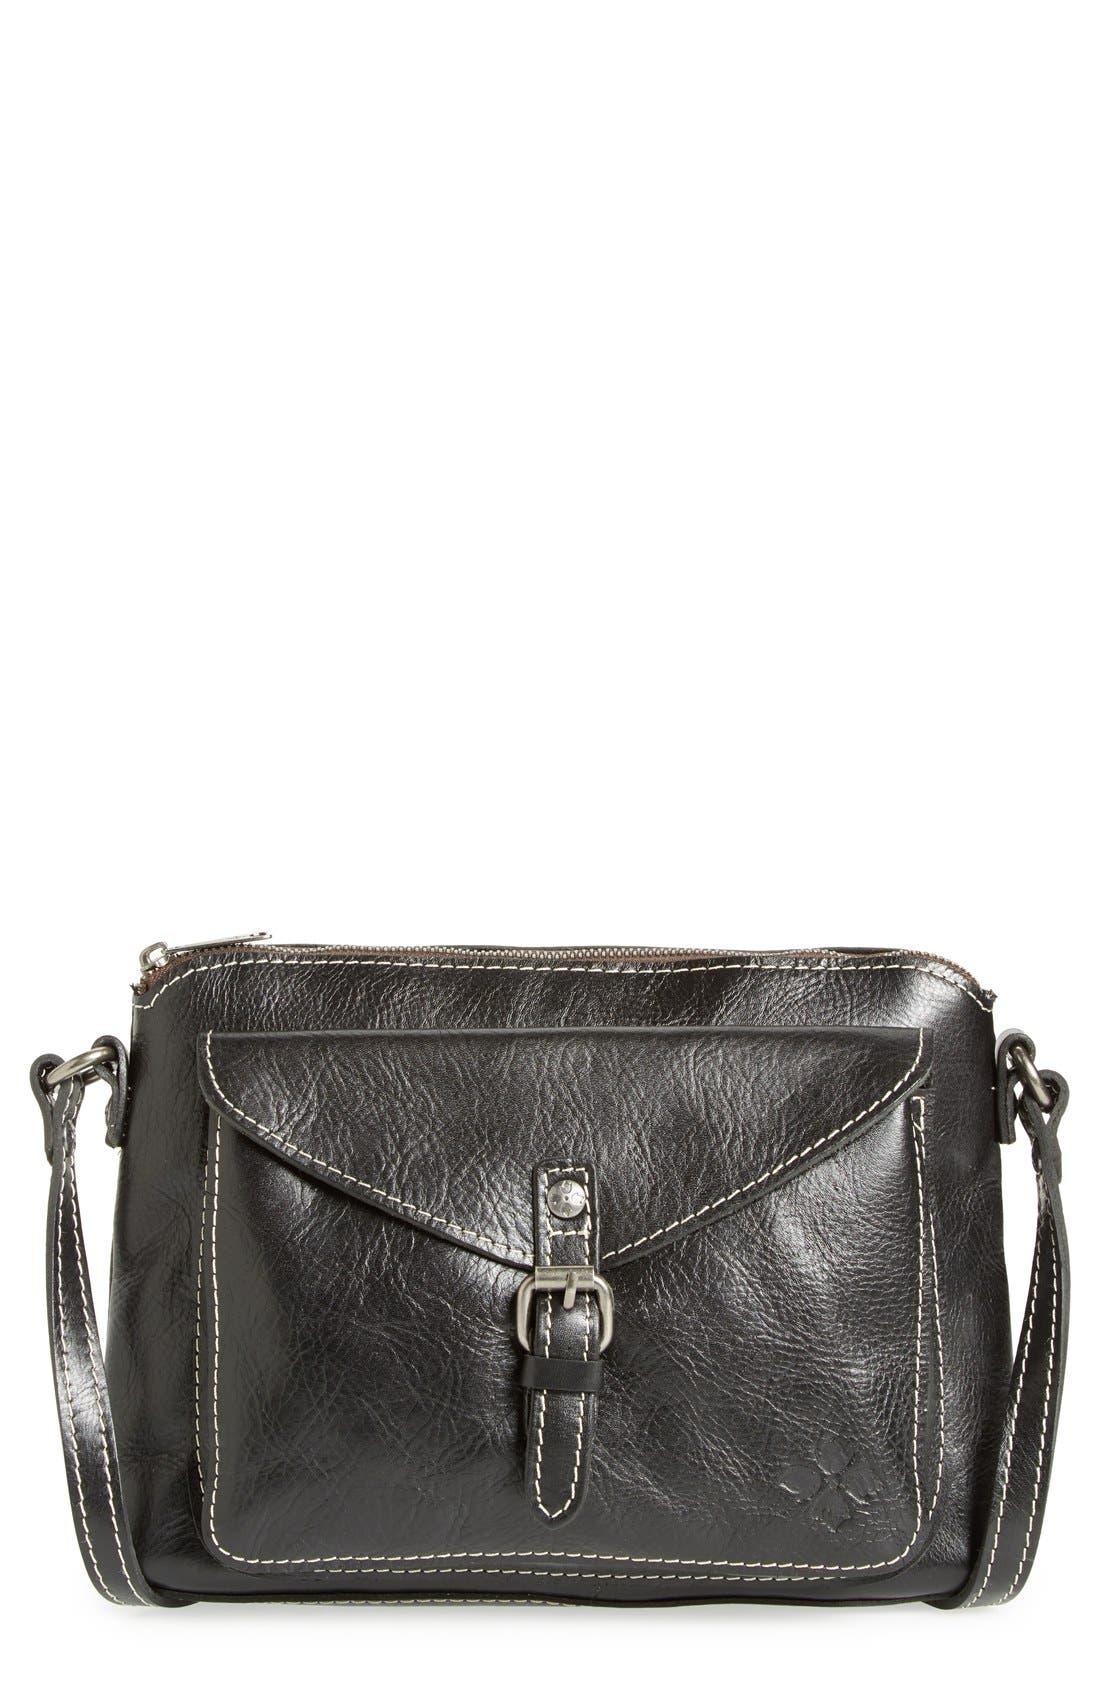 'Avellino' Crossbody Bag,                             Main thumbnail 1, color,                             001